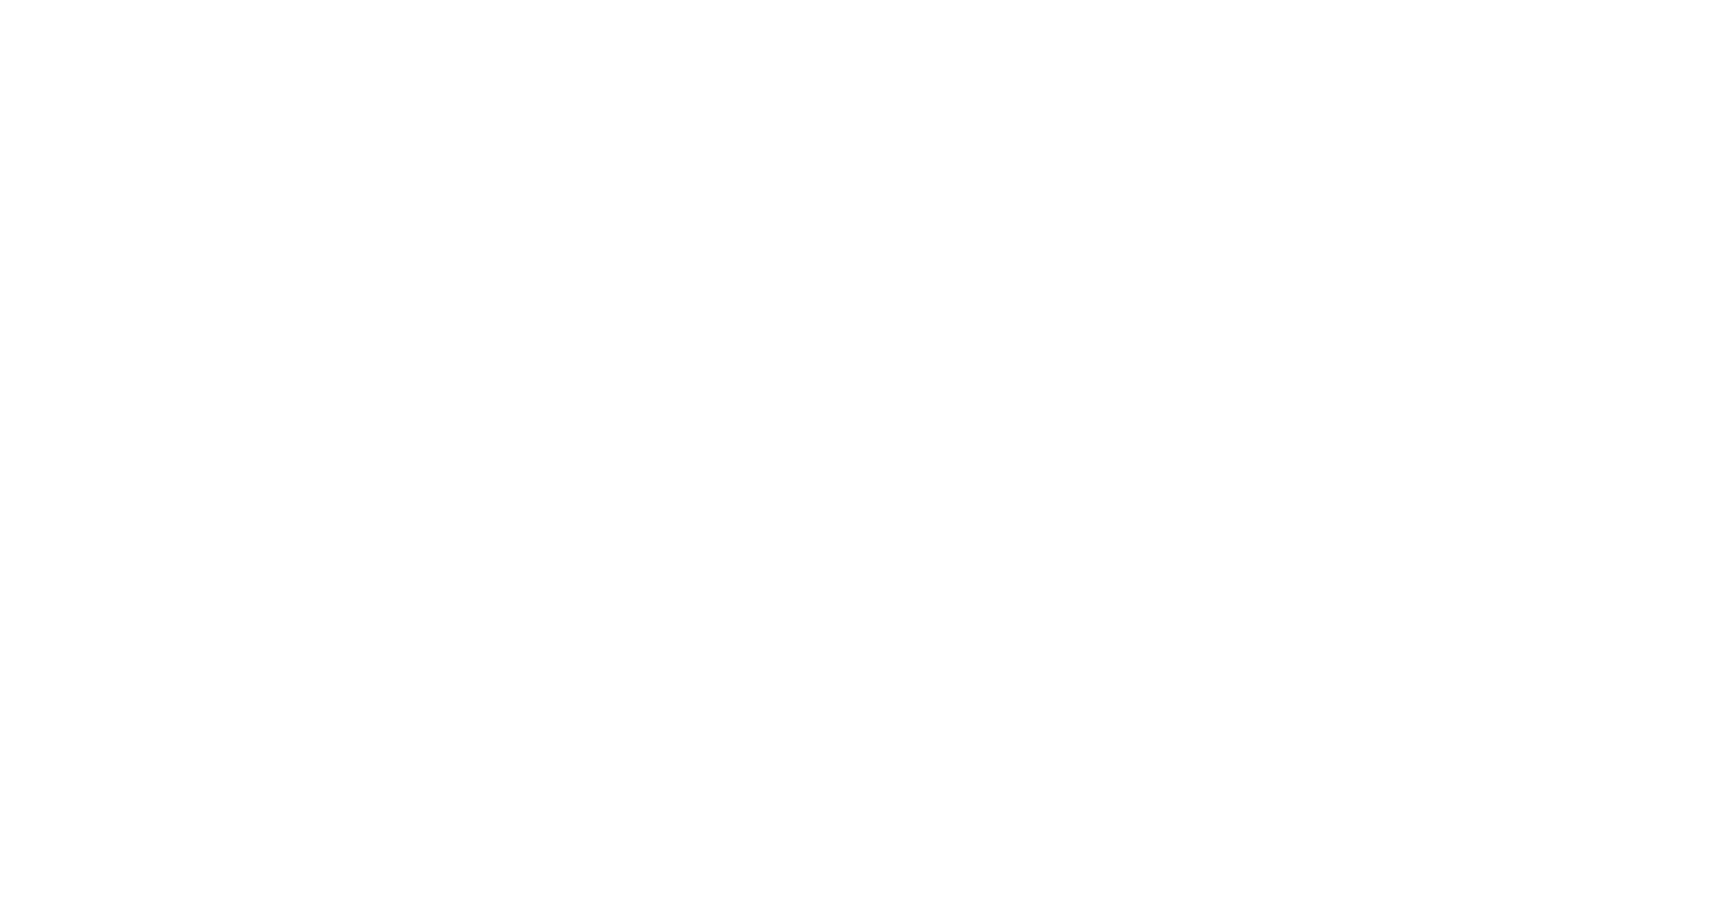 ADFSAP